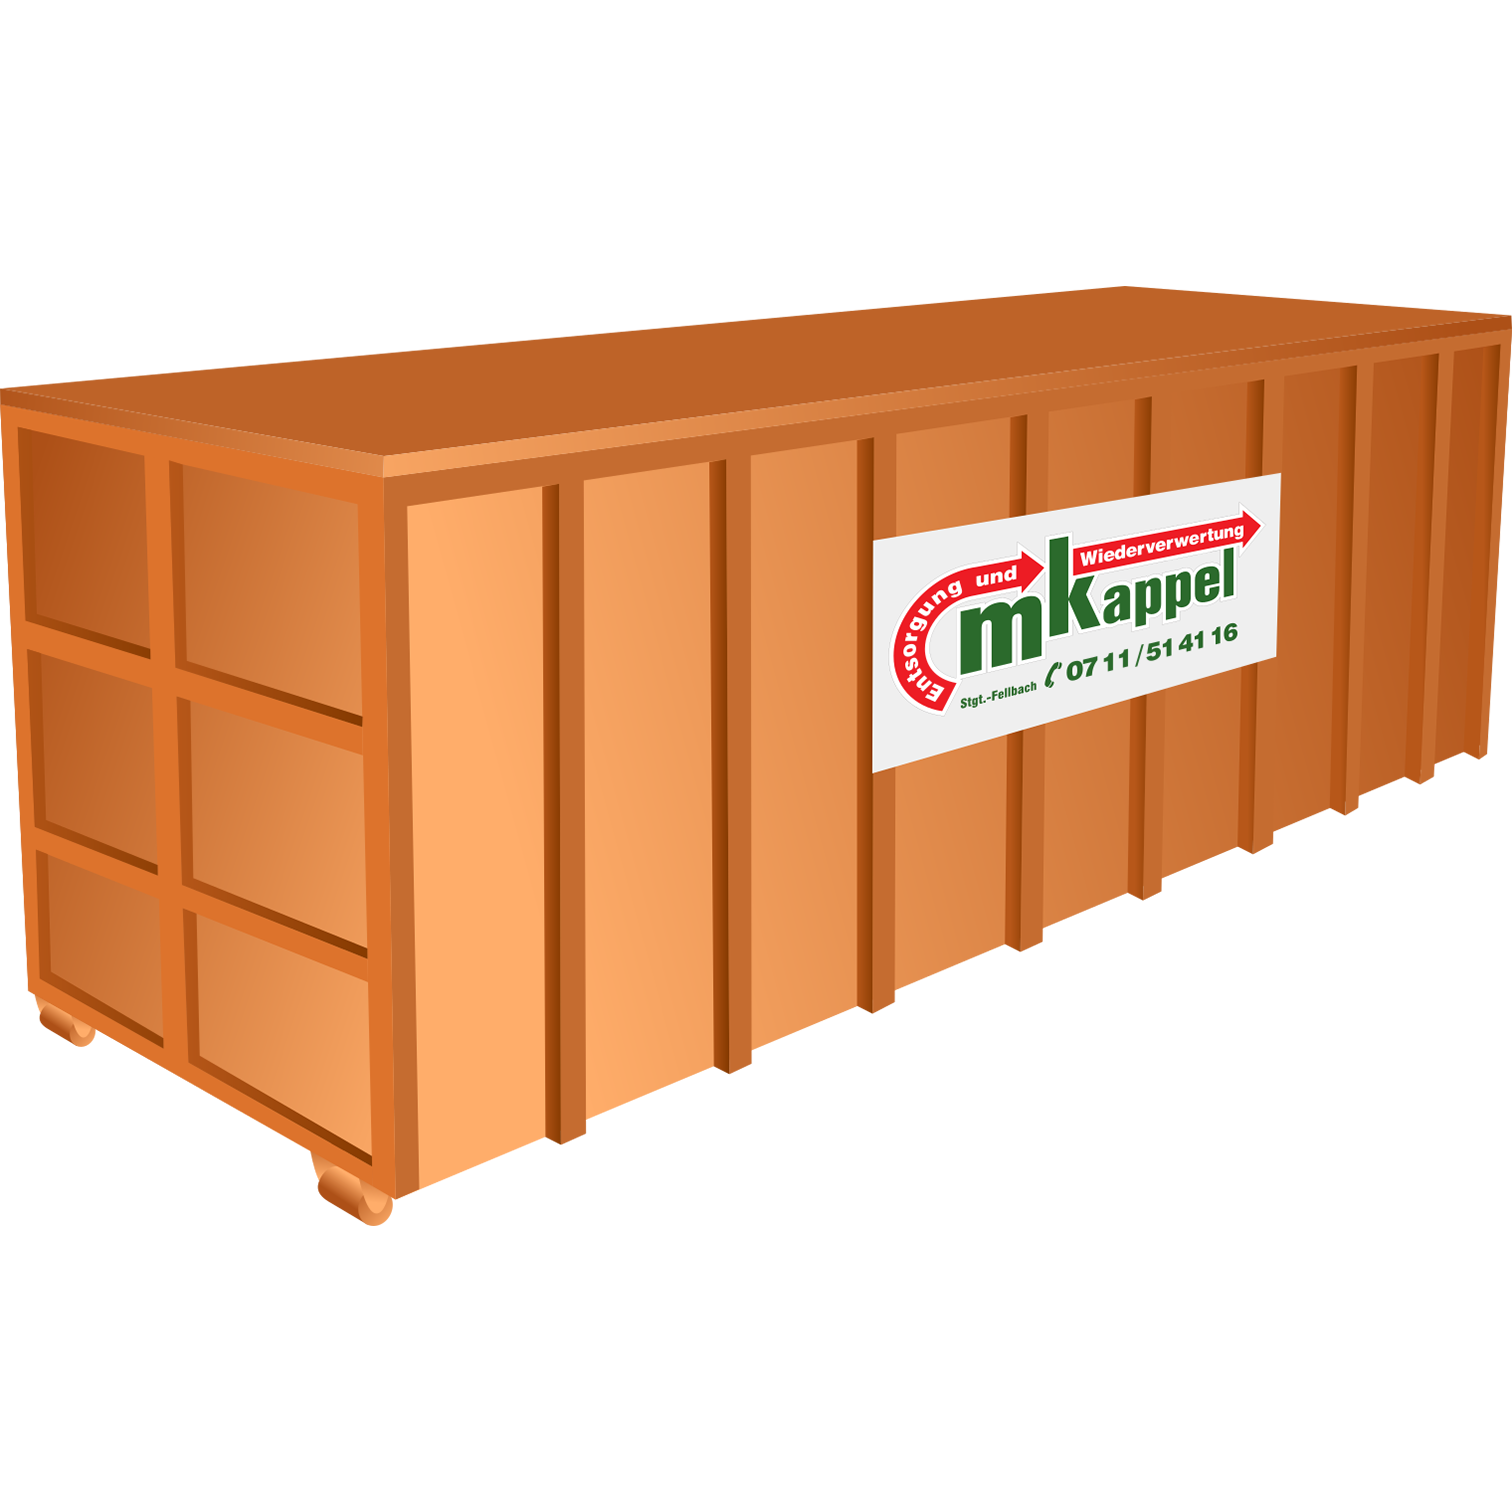 8_abrollcontainer-36cbm-deckel-kappel